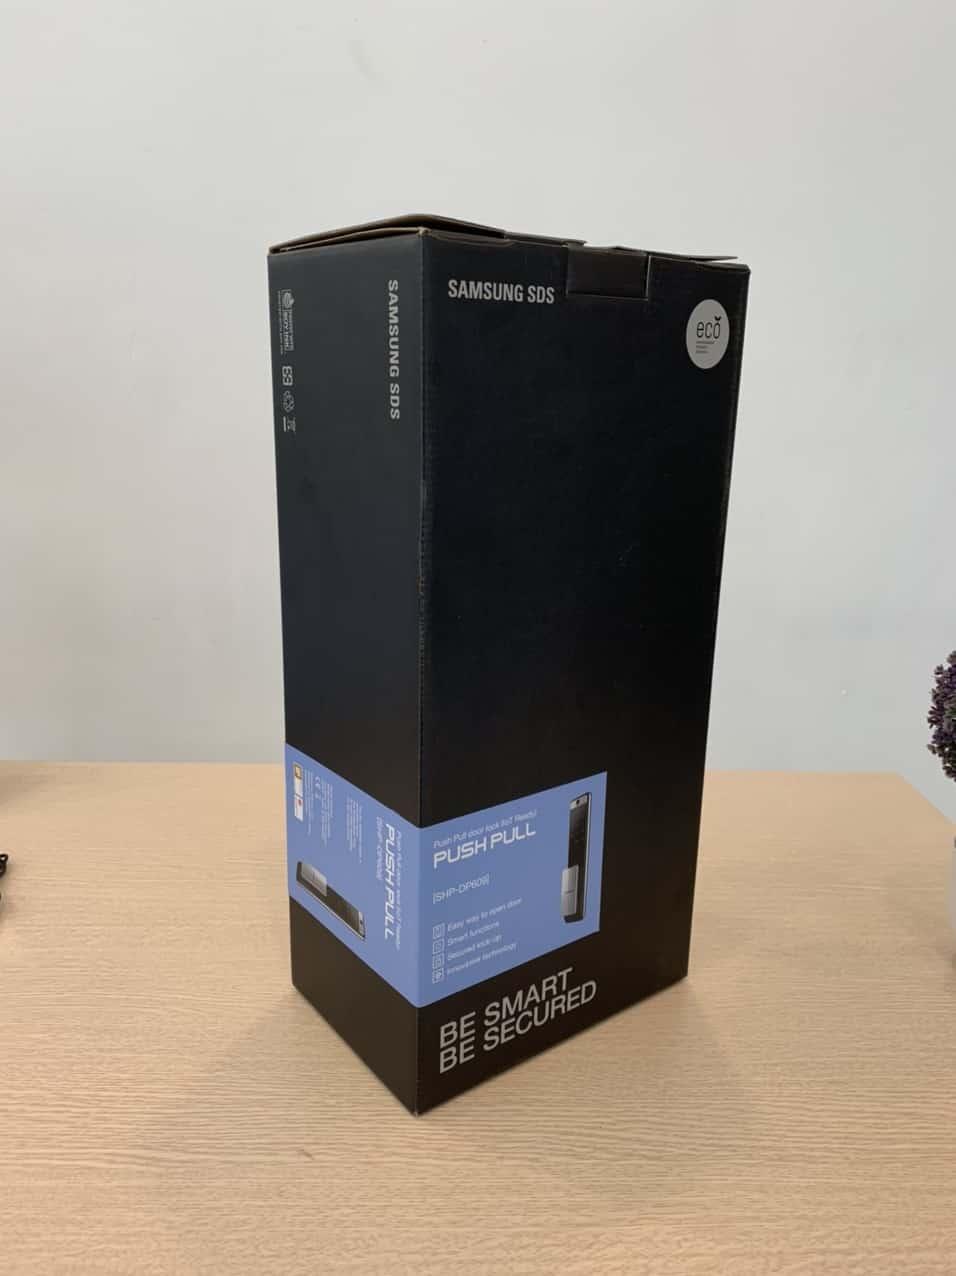 khoa van tay Samsung 609